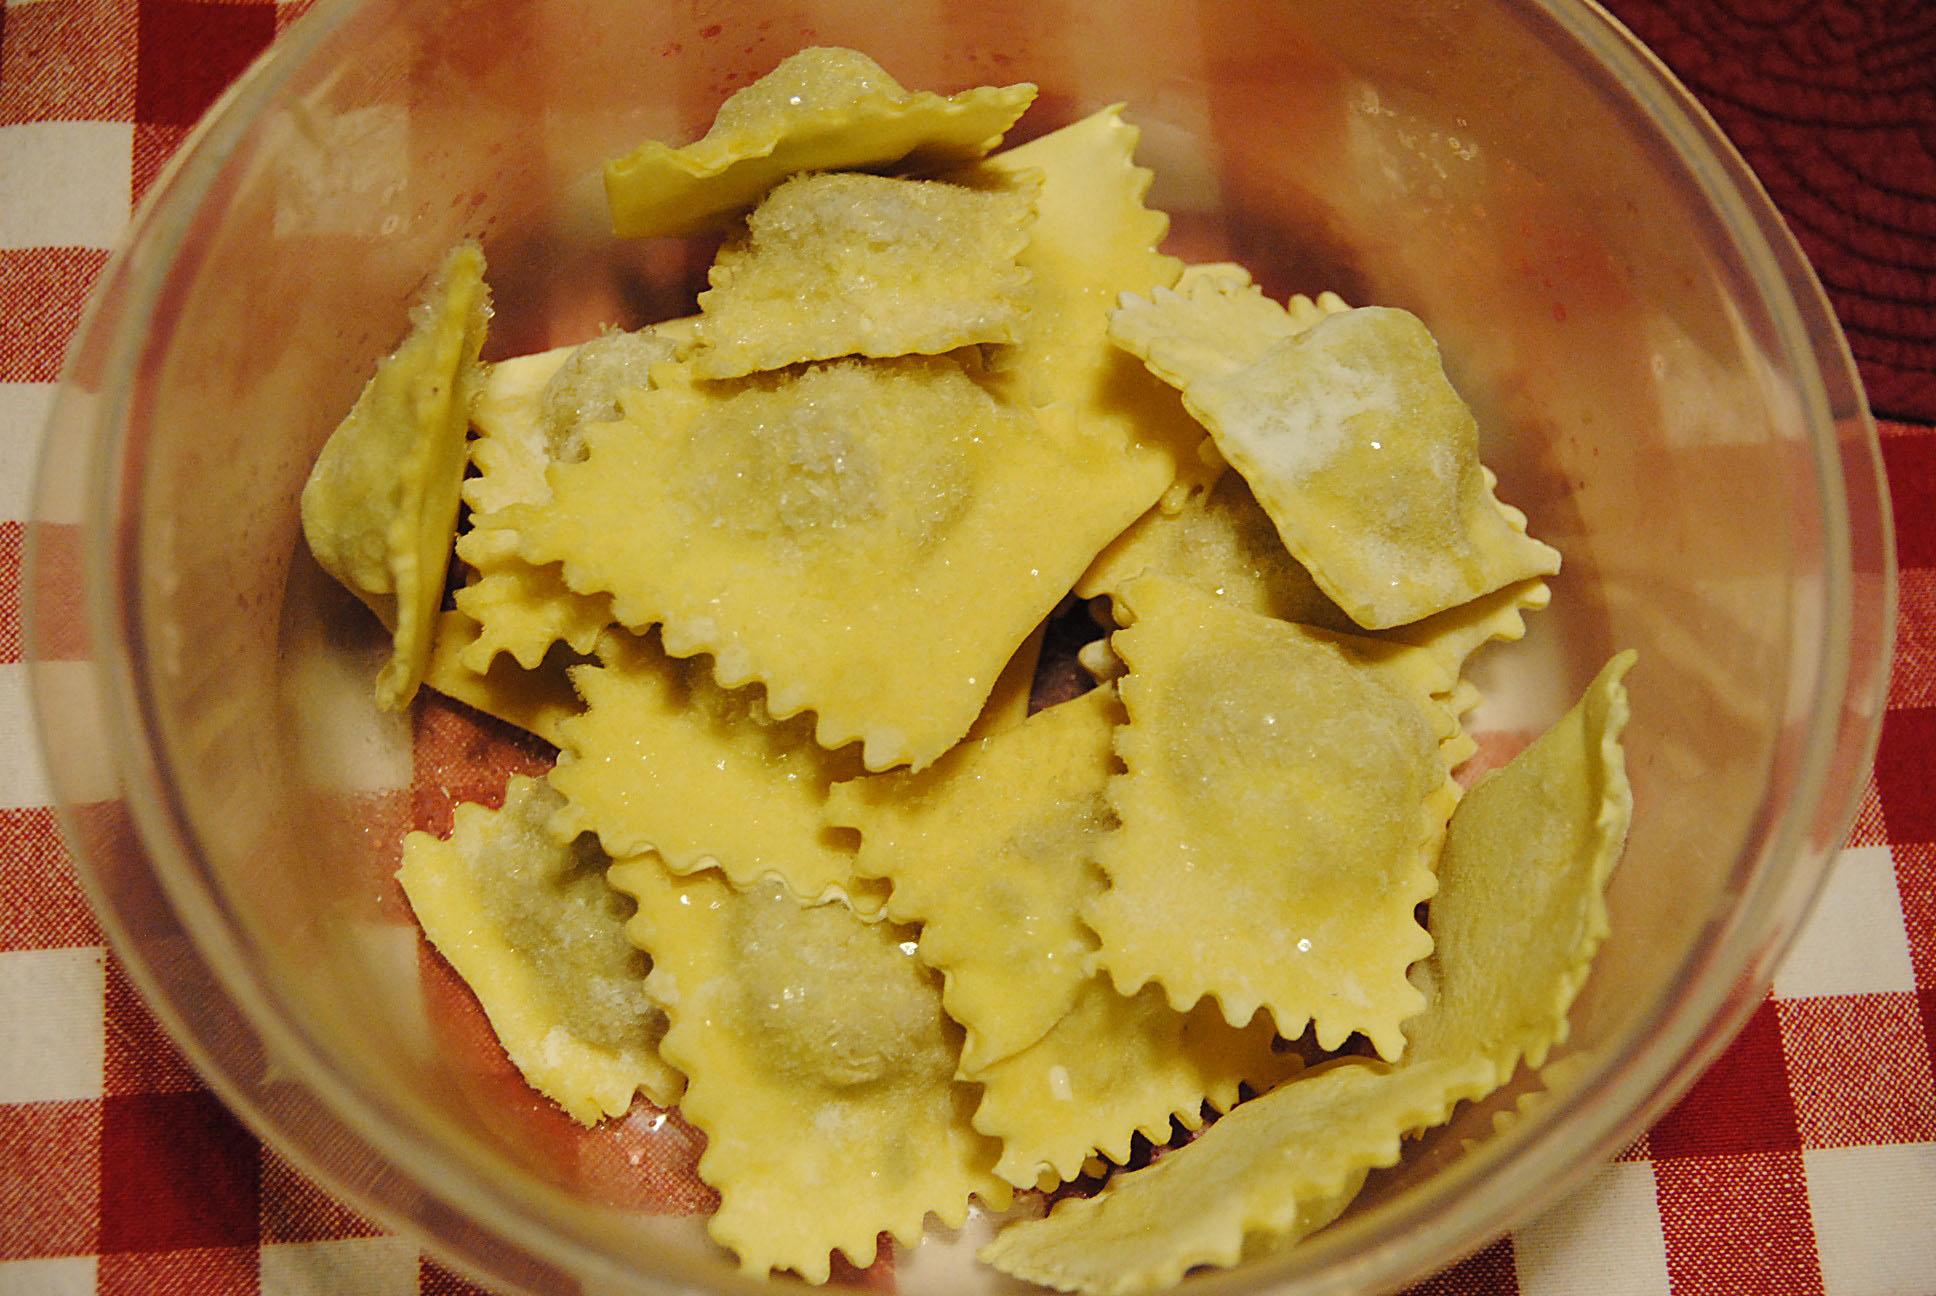 ... : Day 3 Sausage ravioli with ricotta sage cream sauce | Soph n' Stuff